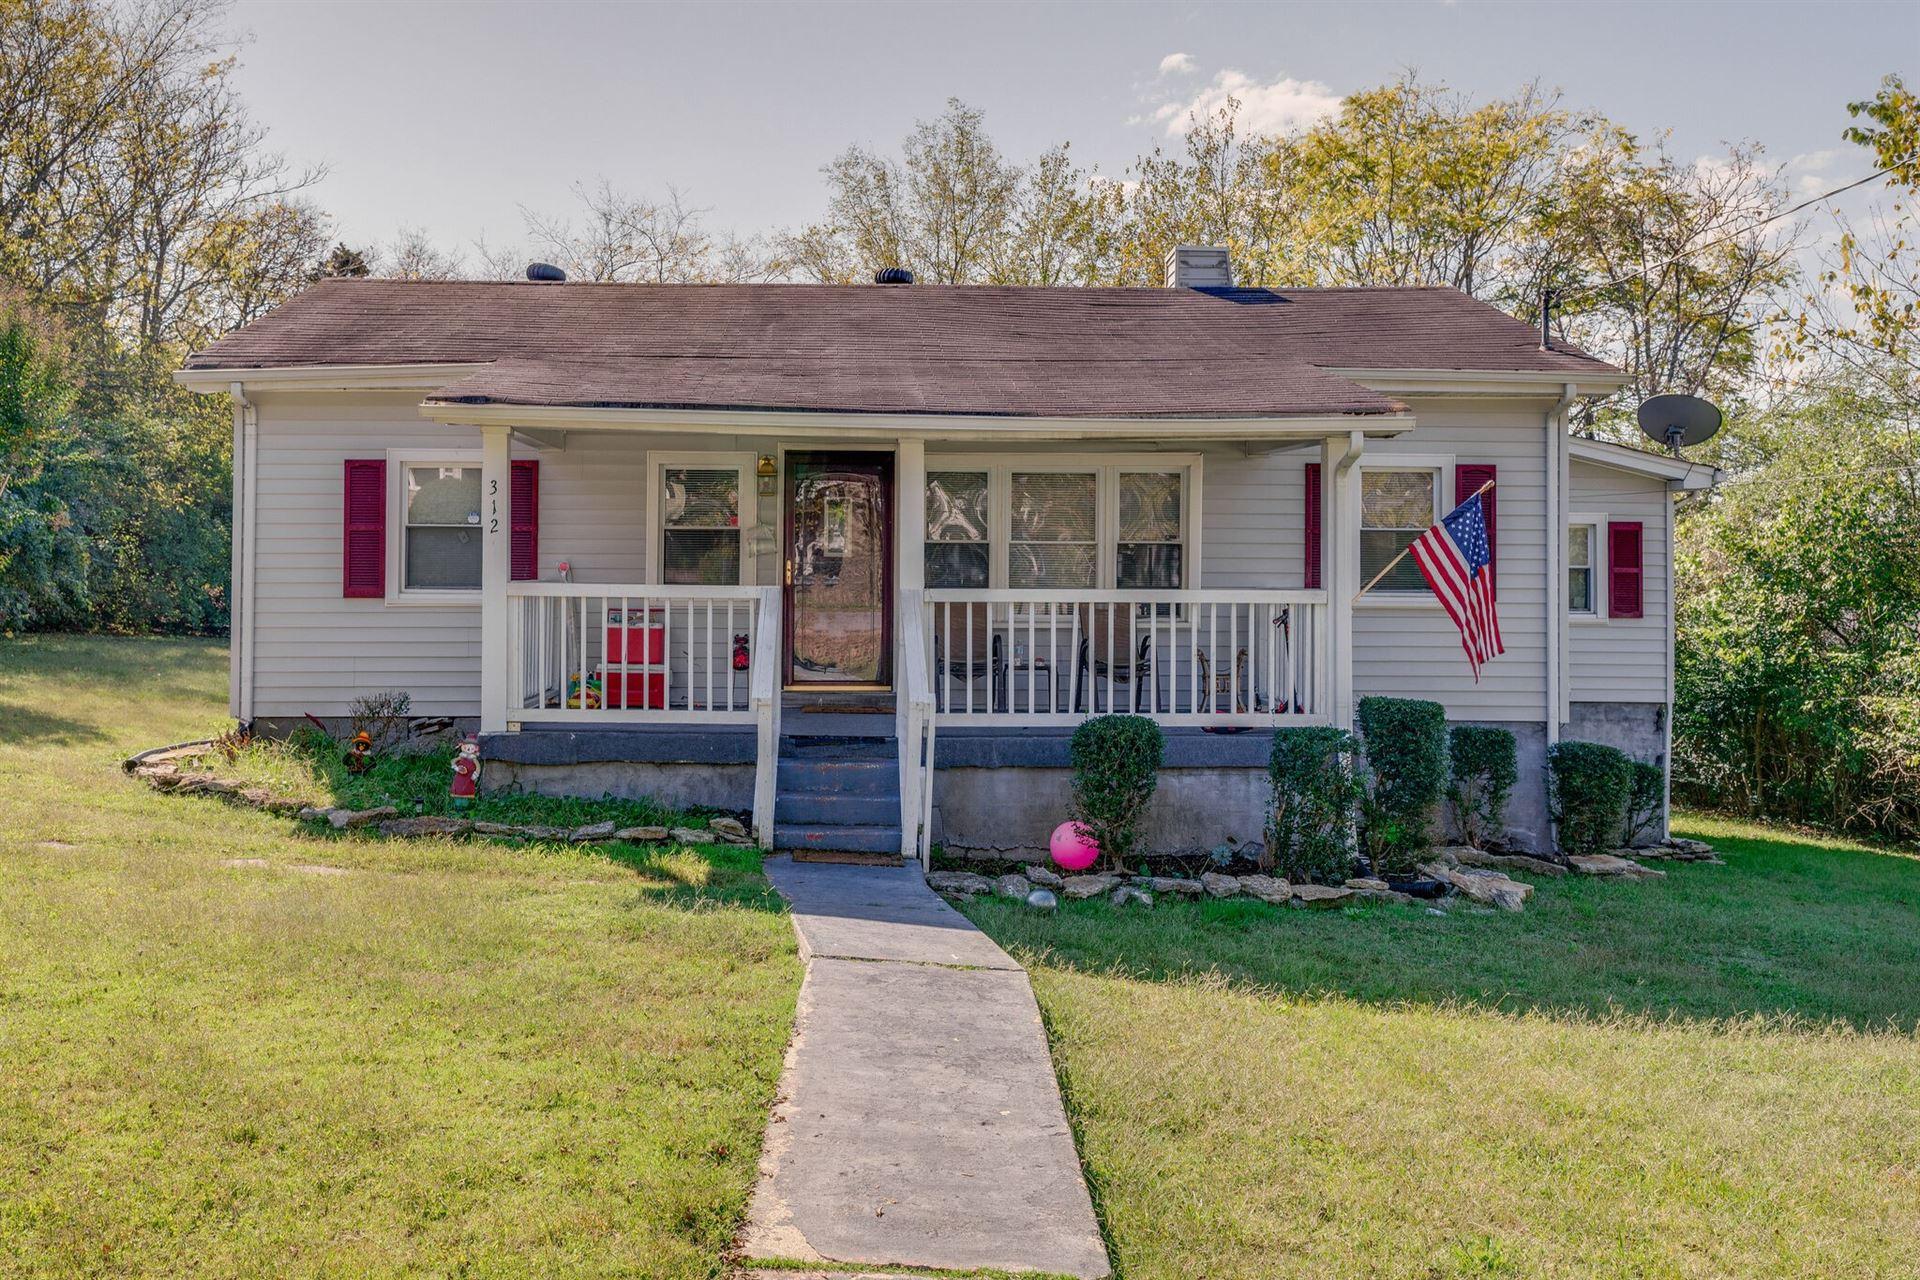 312 Wiley St, Madison, TN 37115 - MLS#: 2199477